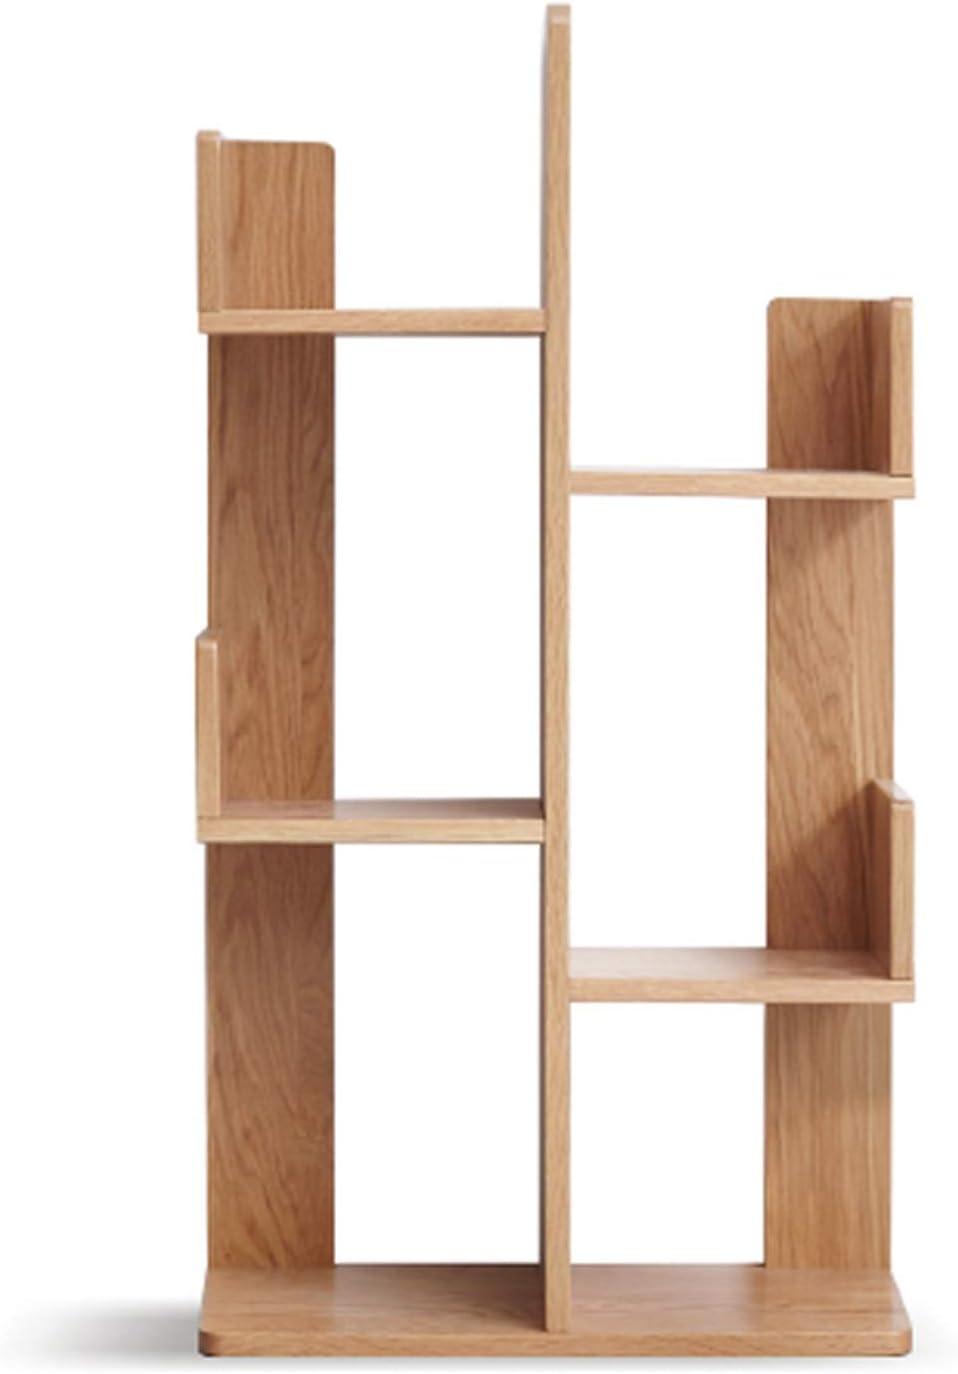 Bookshelf Wooden 3-Tier Courier shipping free Freestanding Under blast sales Mu Floor Standing